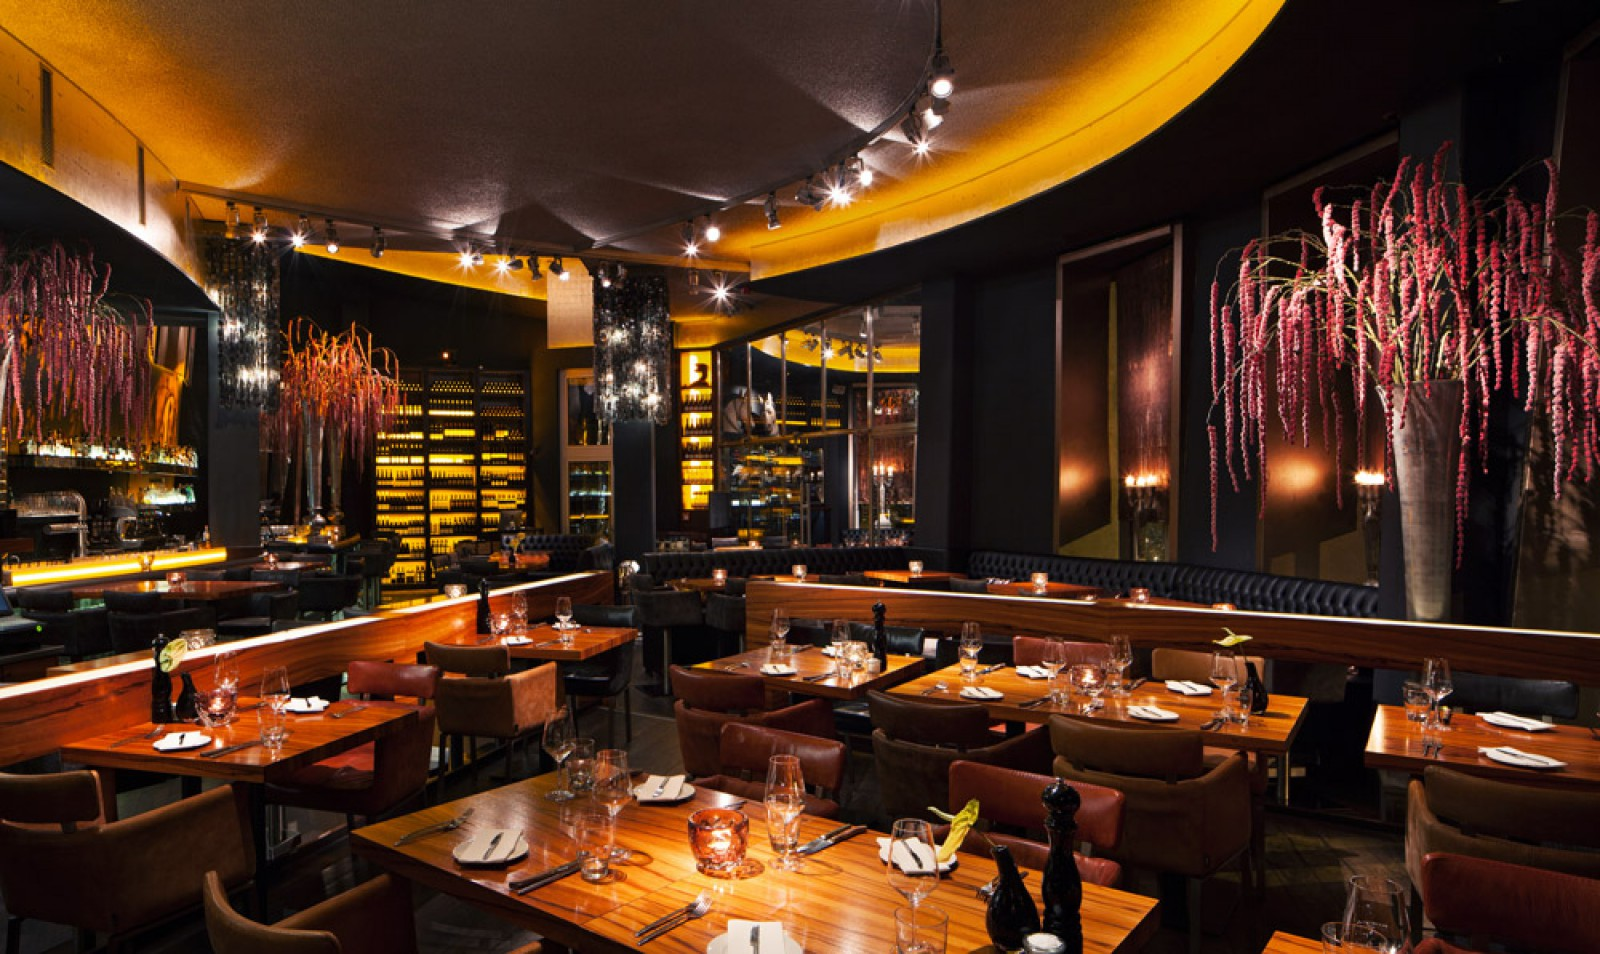 restaurant rocca im gehryaposs in d sseldorf. Black Bedroom Furniture Sets. Home Design Ideas